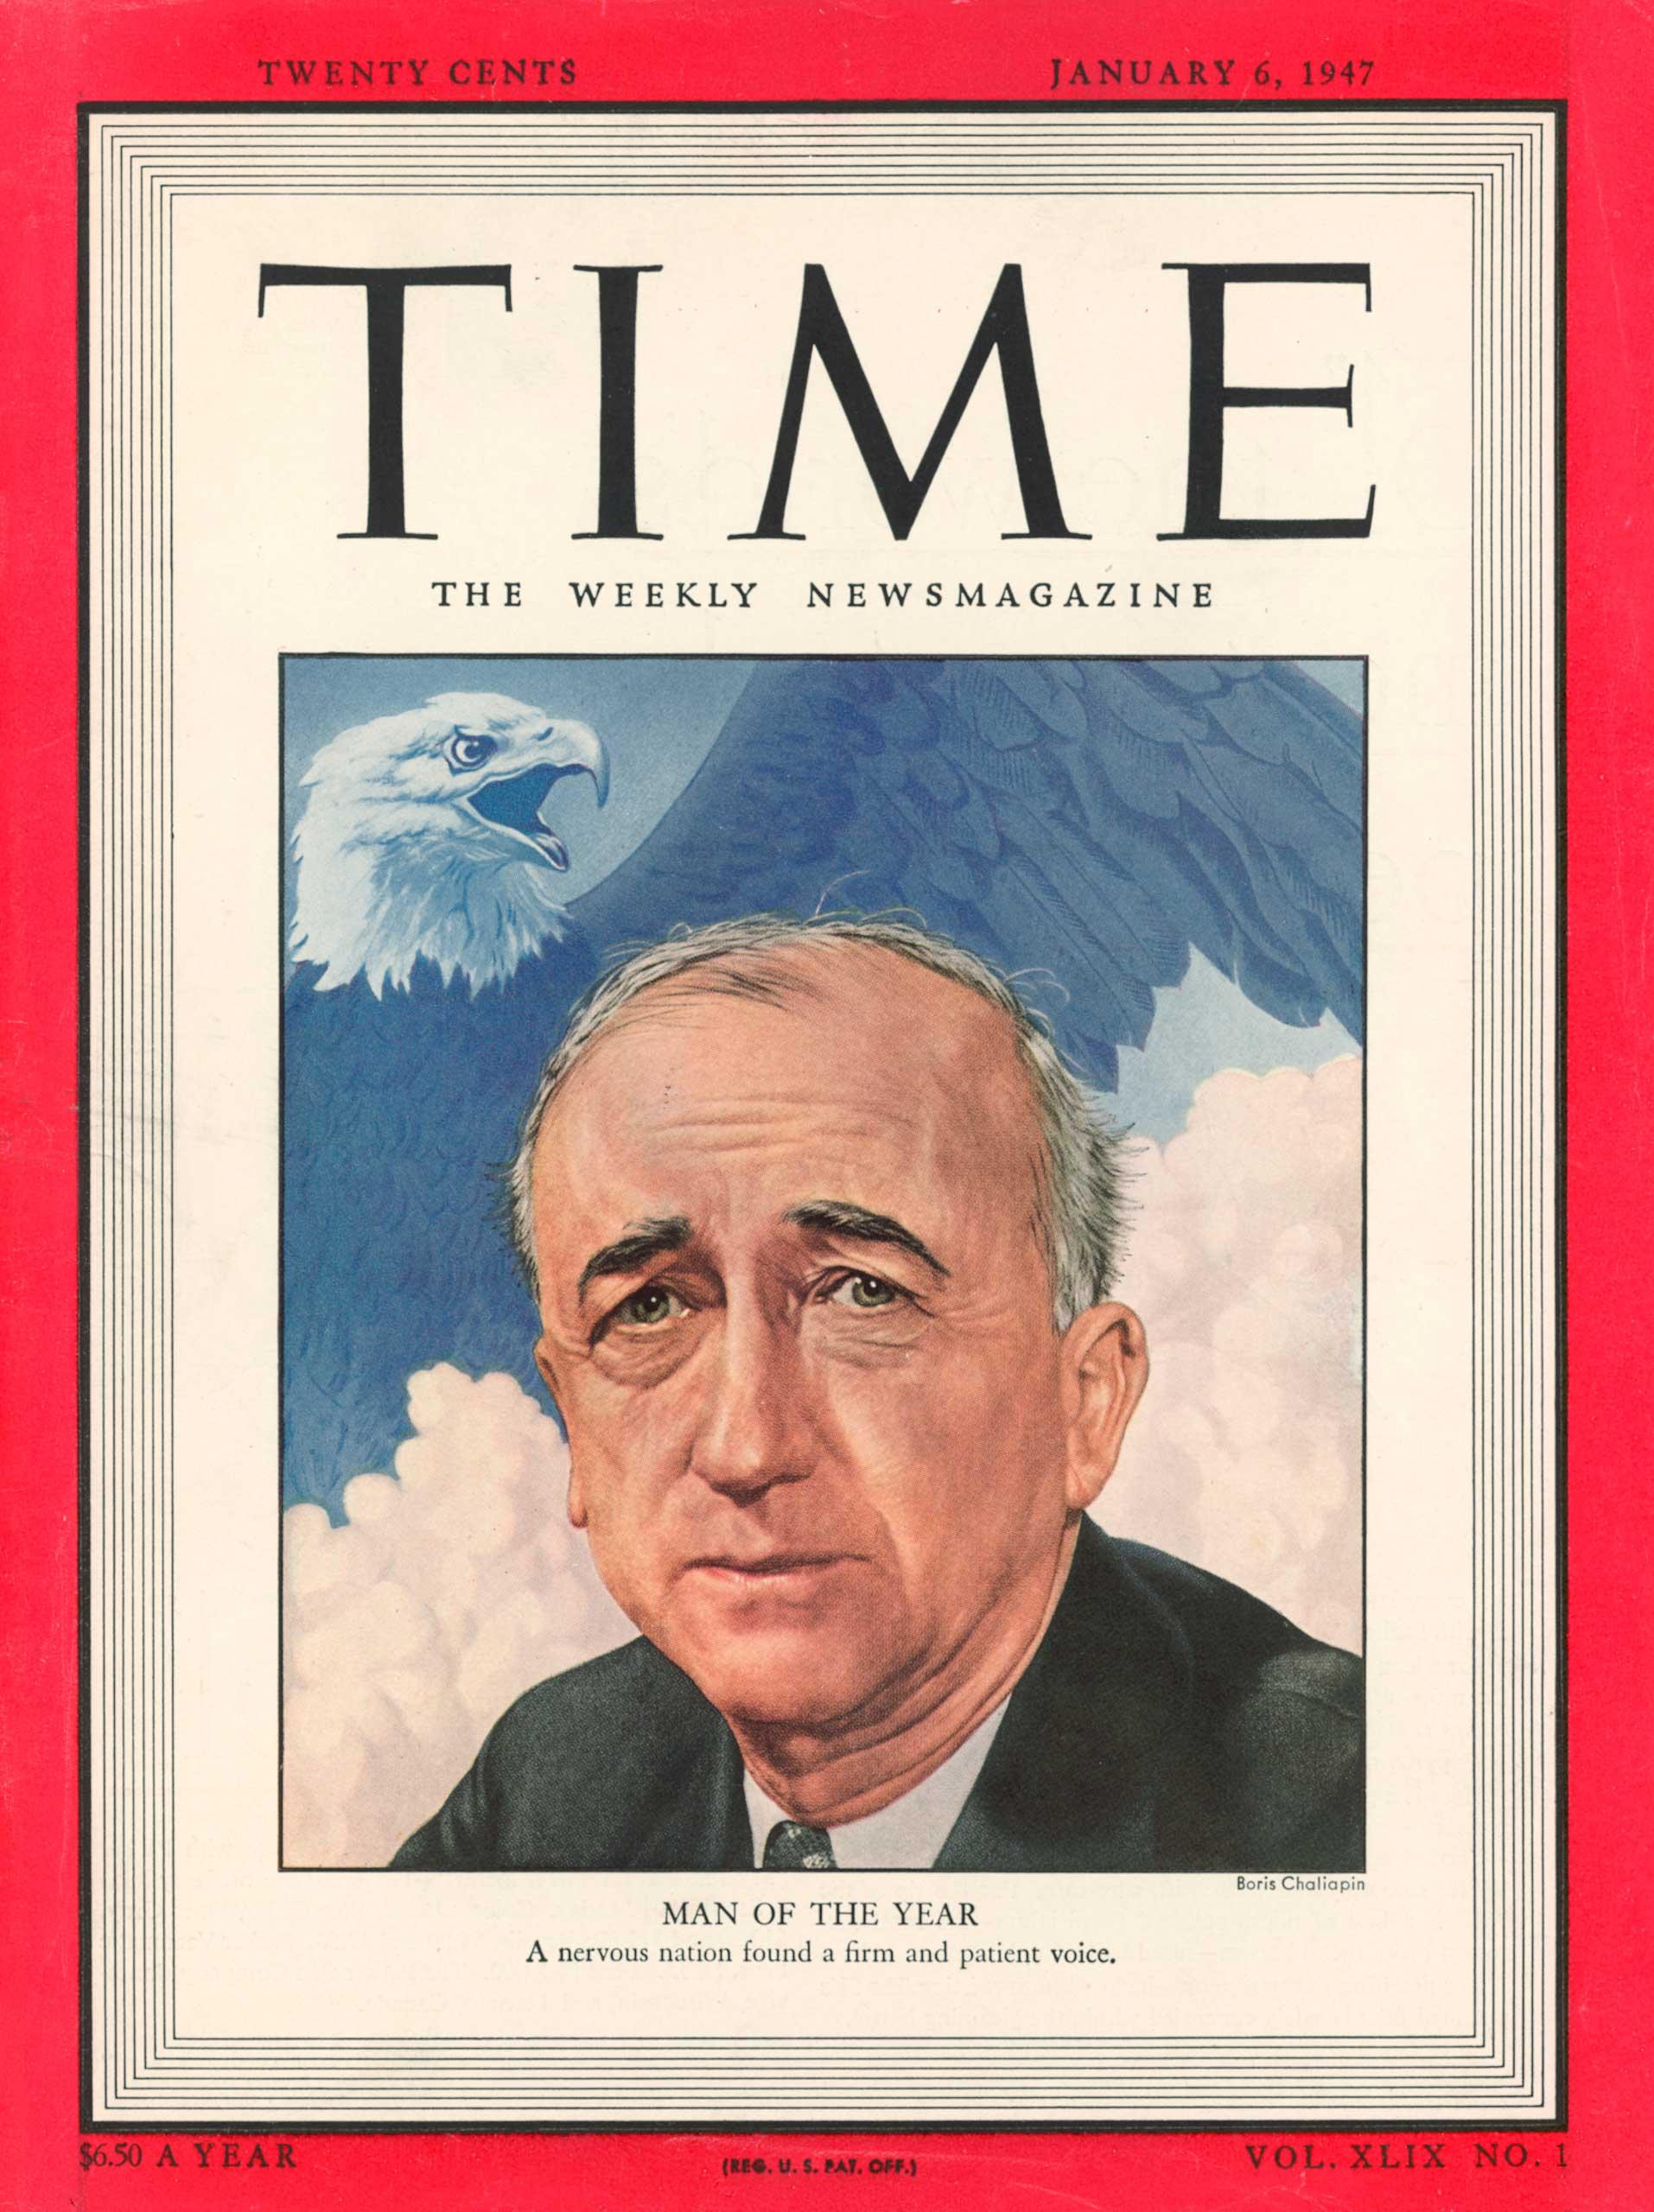 1946: James F. Byrnes